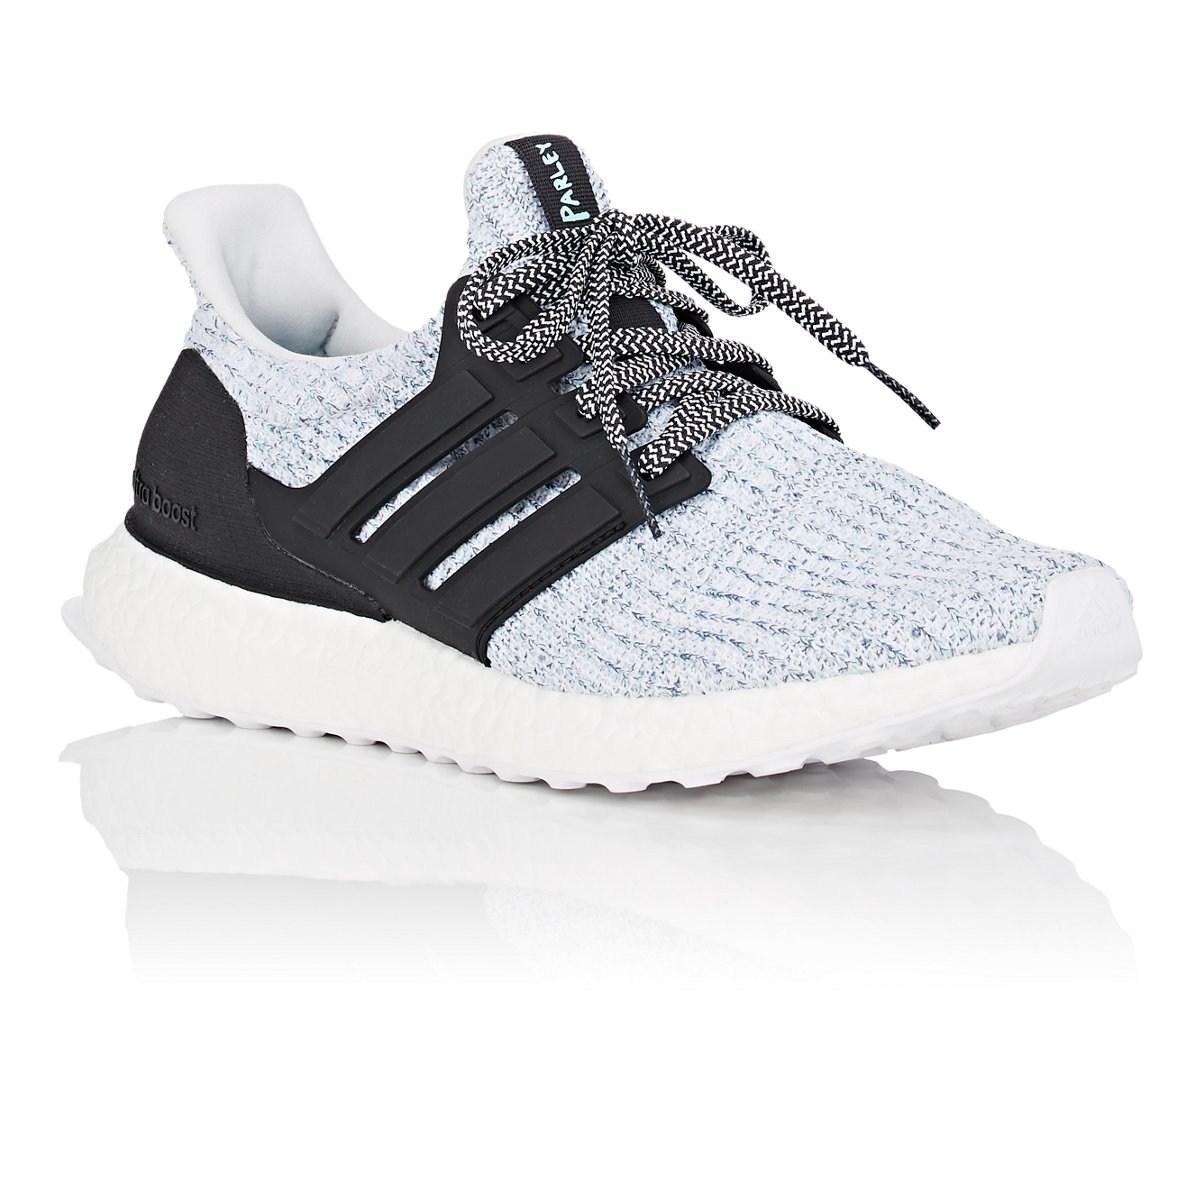 ffa509fce Adidas - Blue Ultraboost Primeknit Sneakers - Lyst. View fullscreen